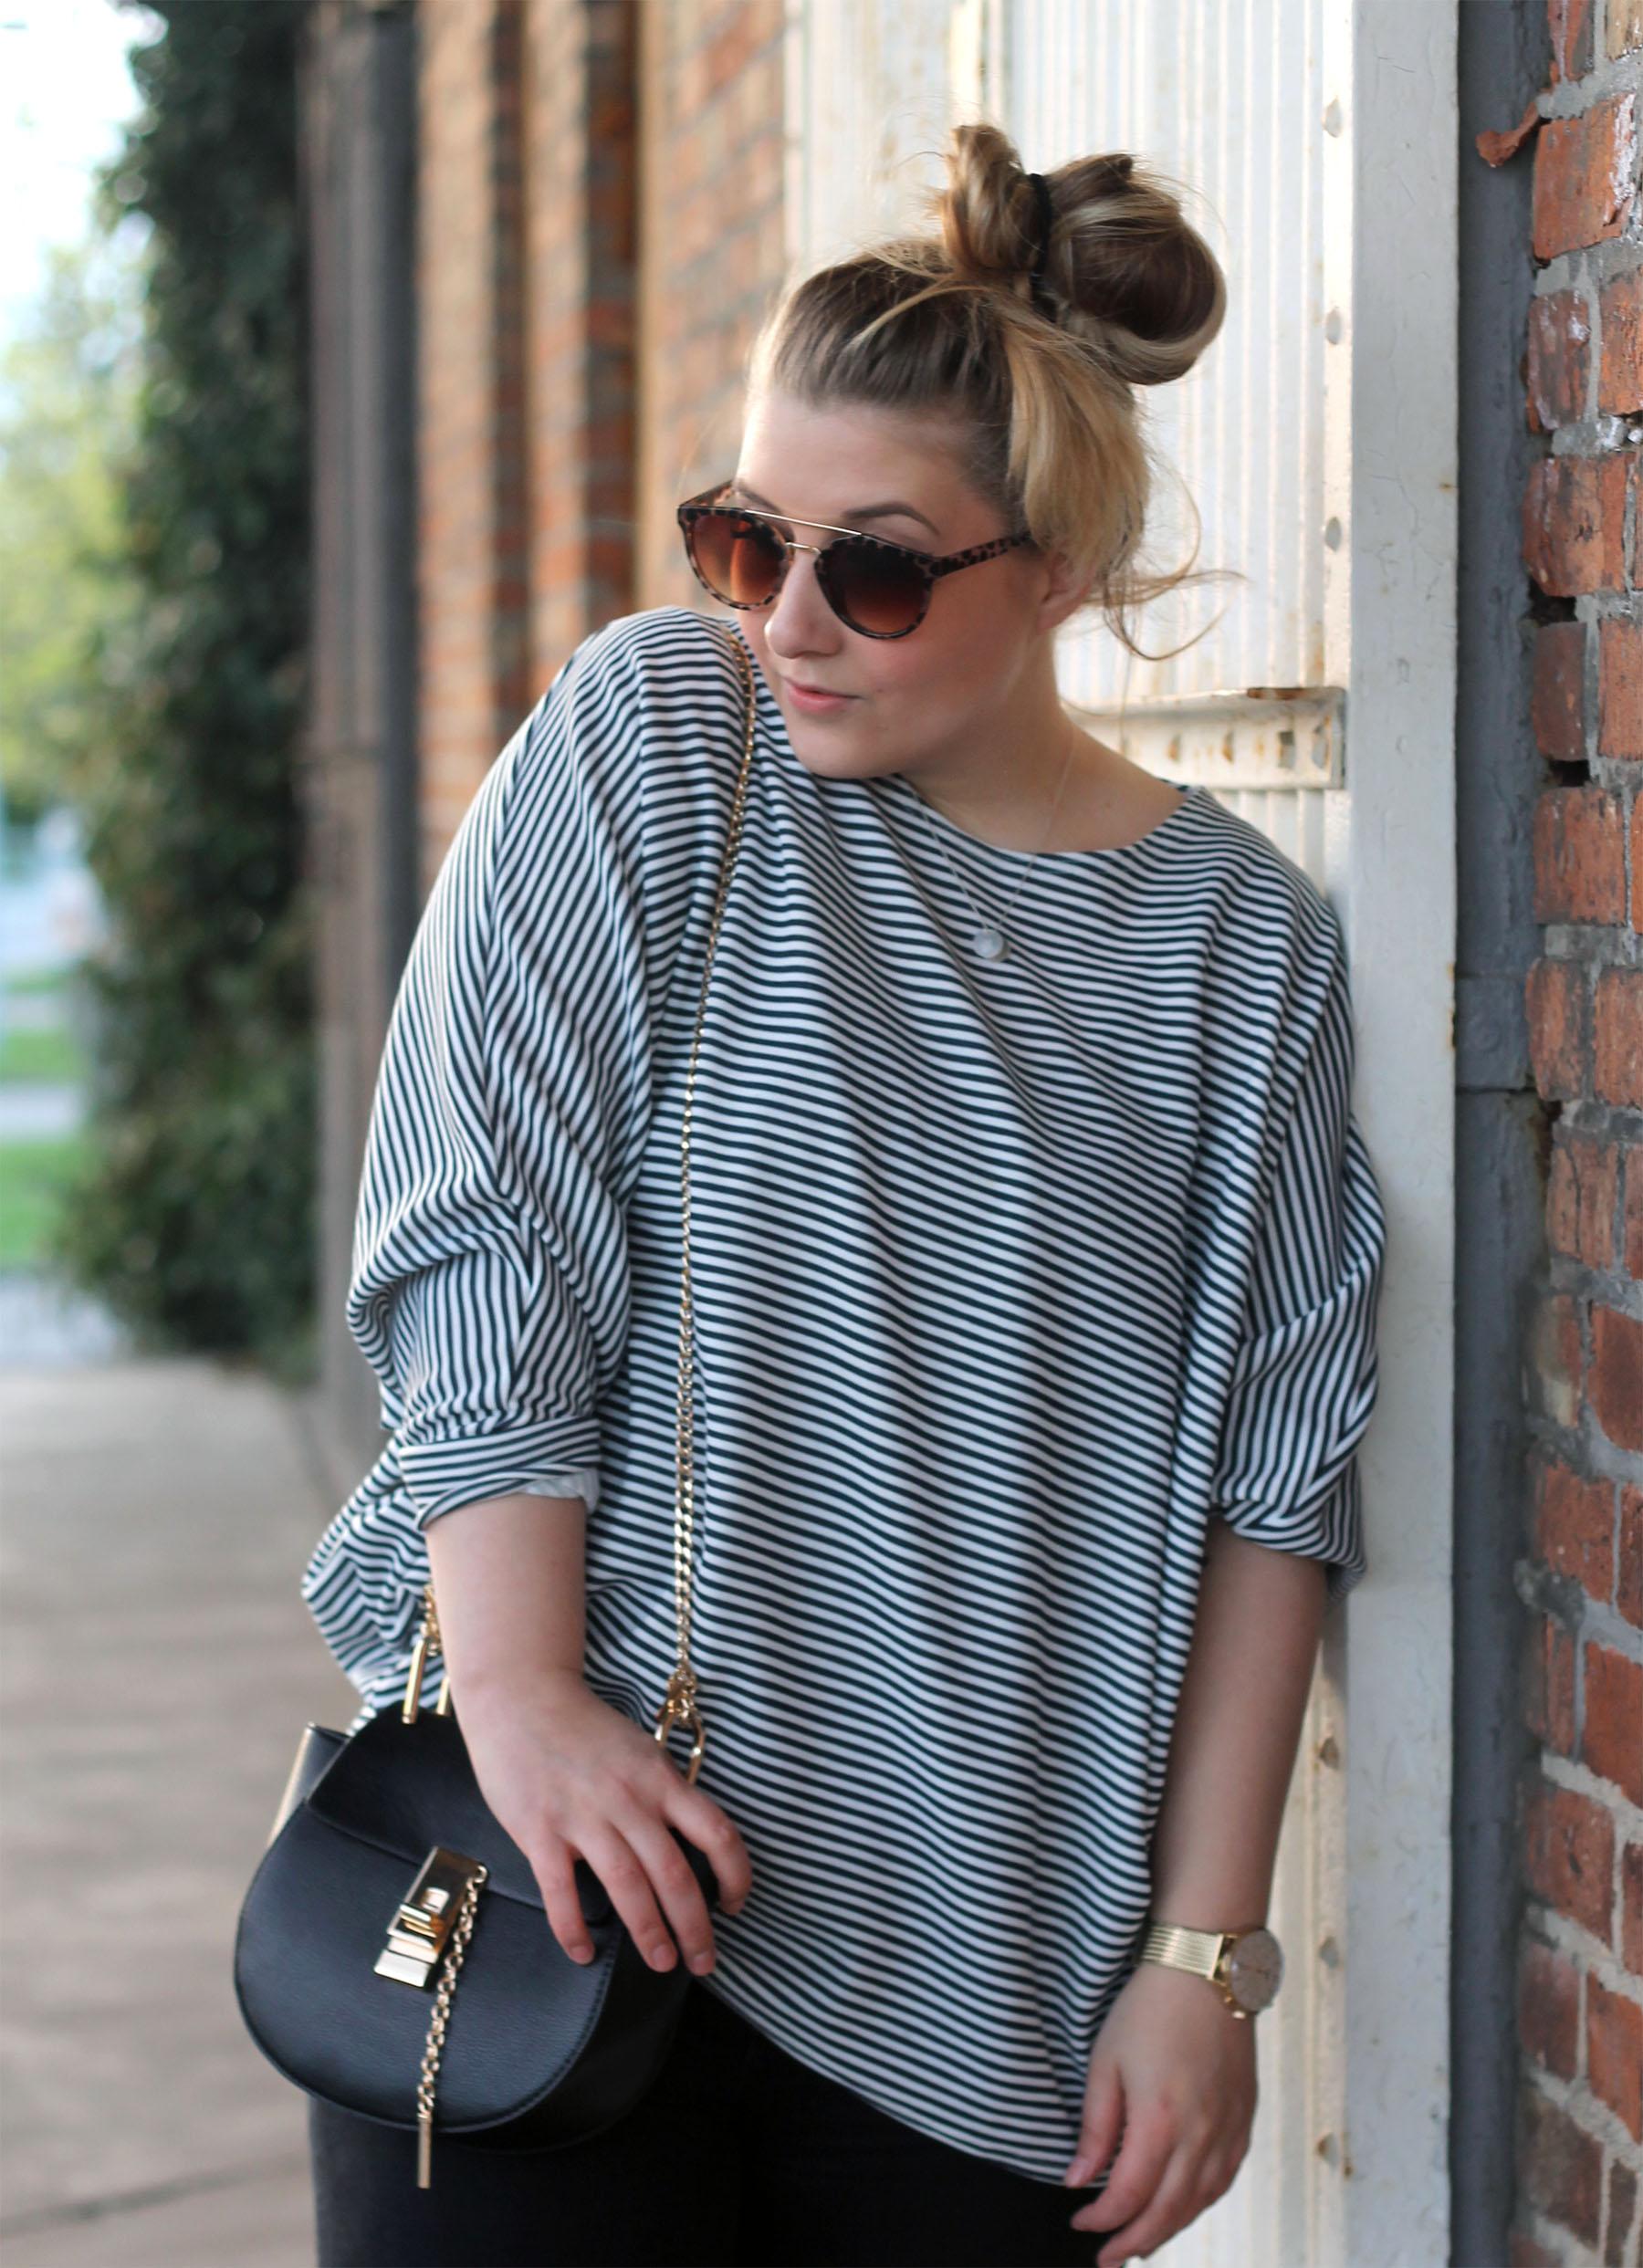 tasche-chloe-modeblogger.fashionblogger-messybun-haare